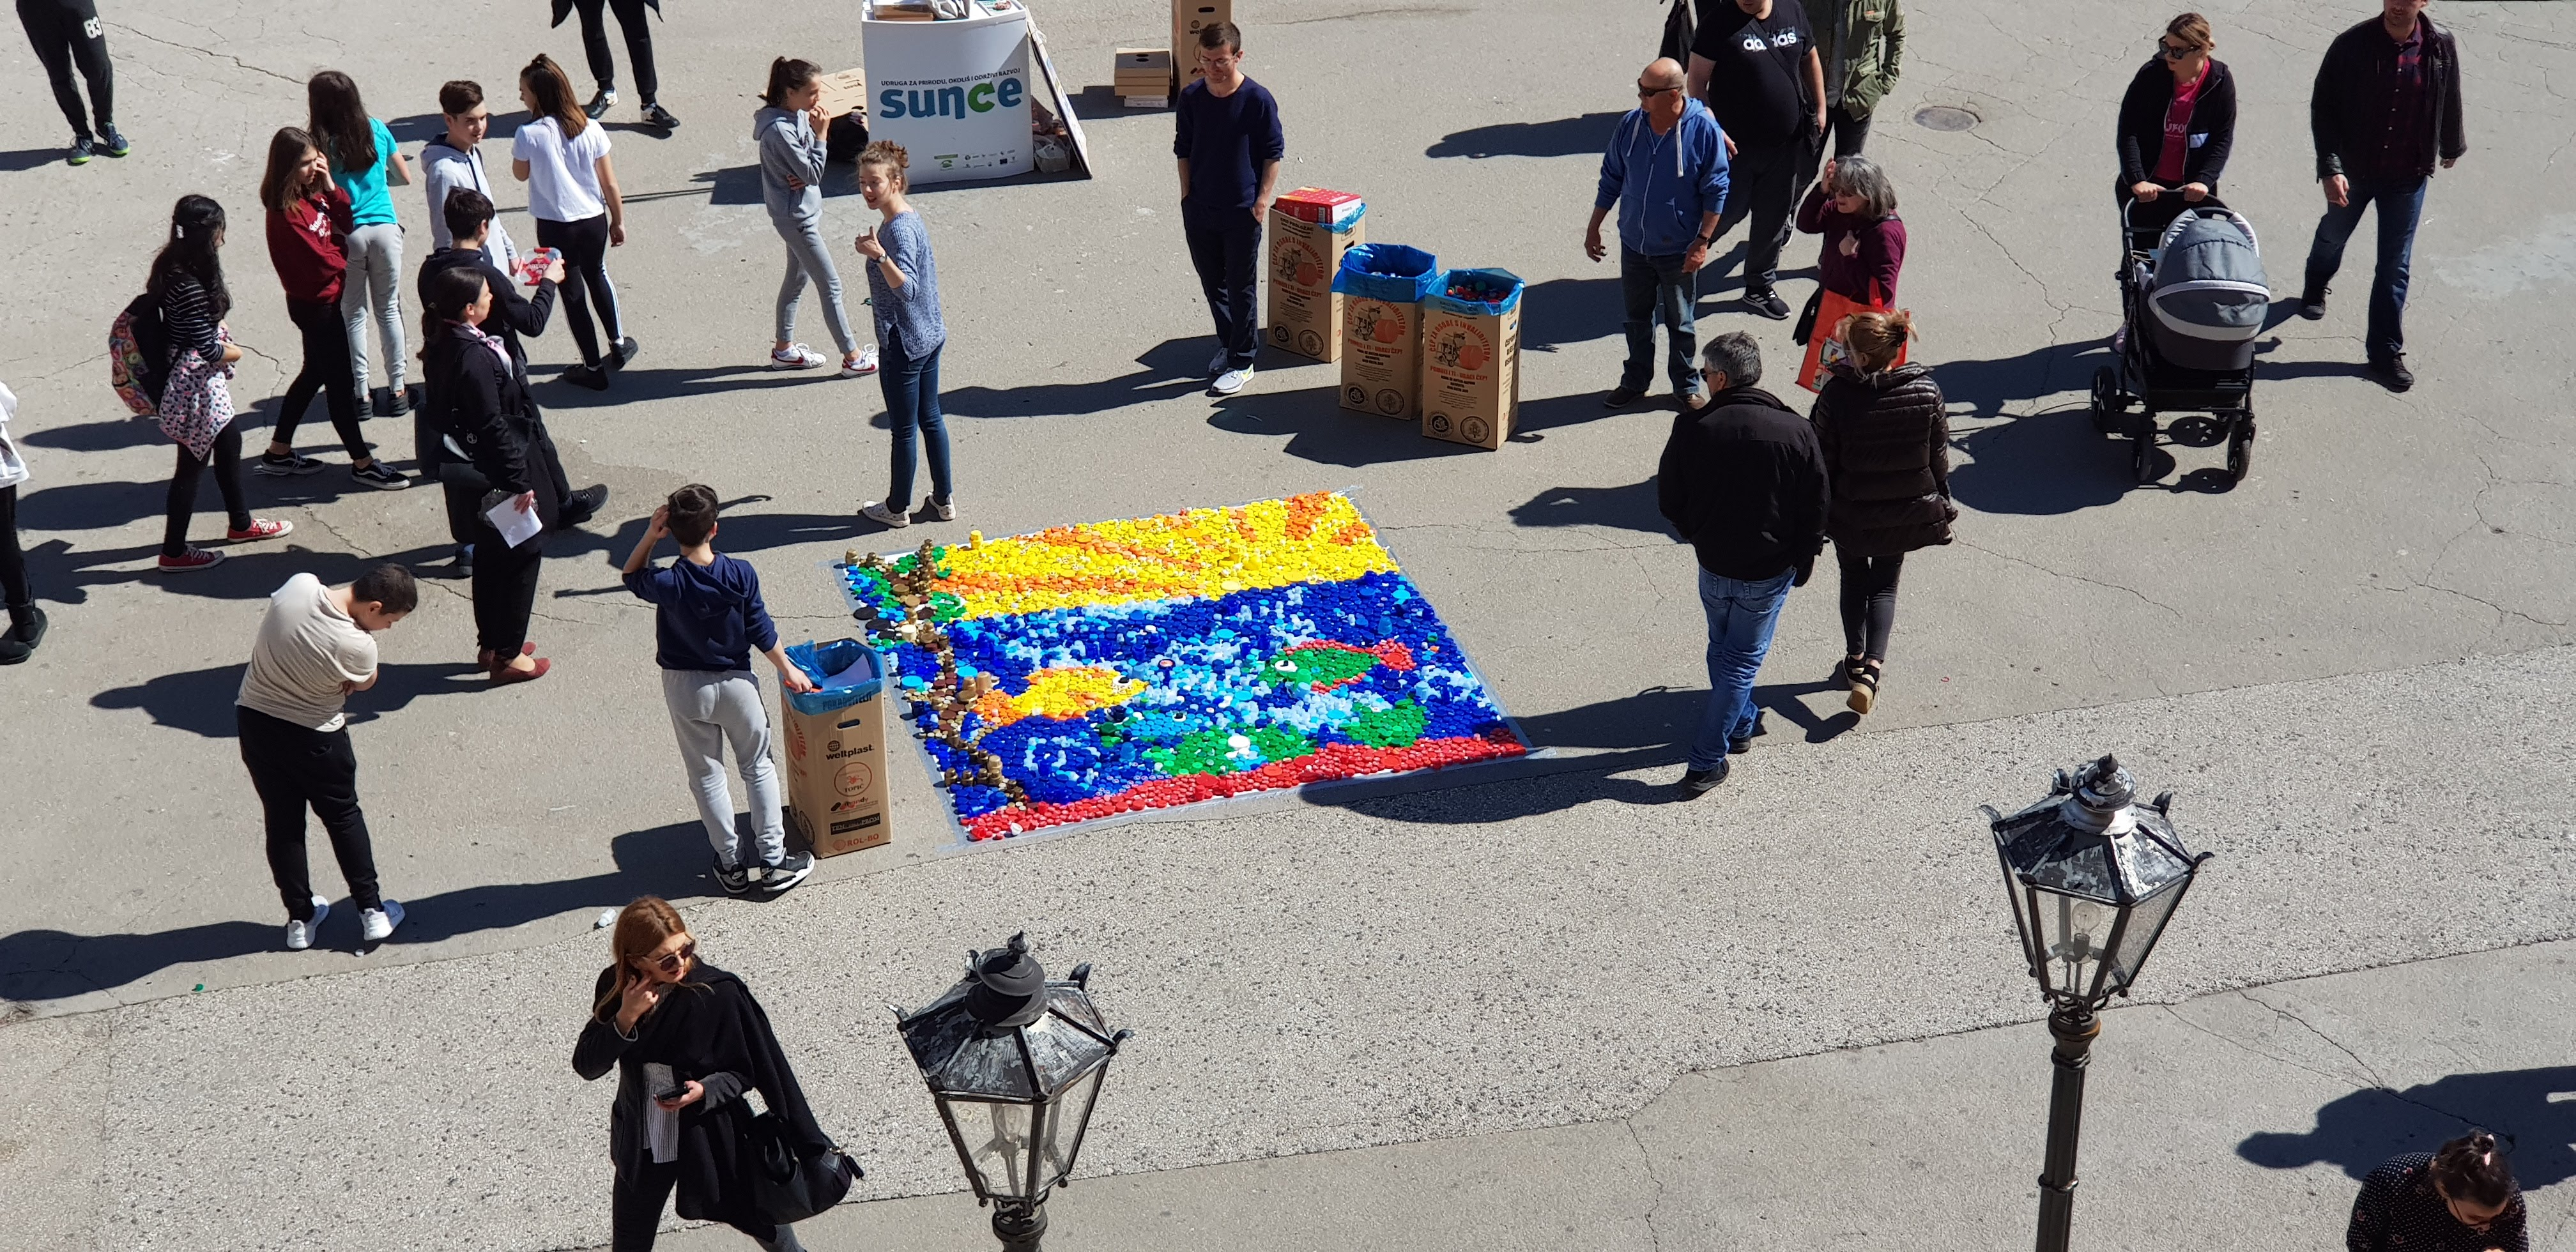 Čepozaik! Eco-Humanitarian Public Event